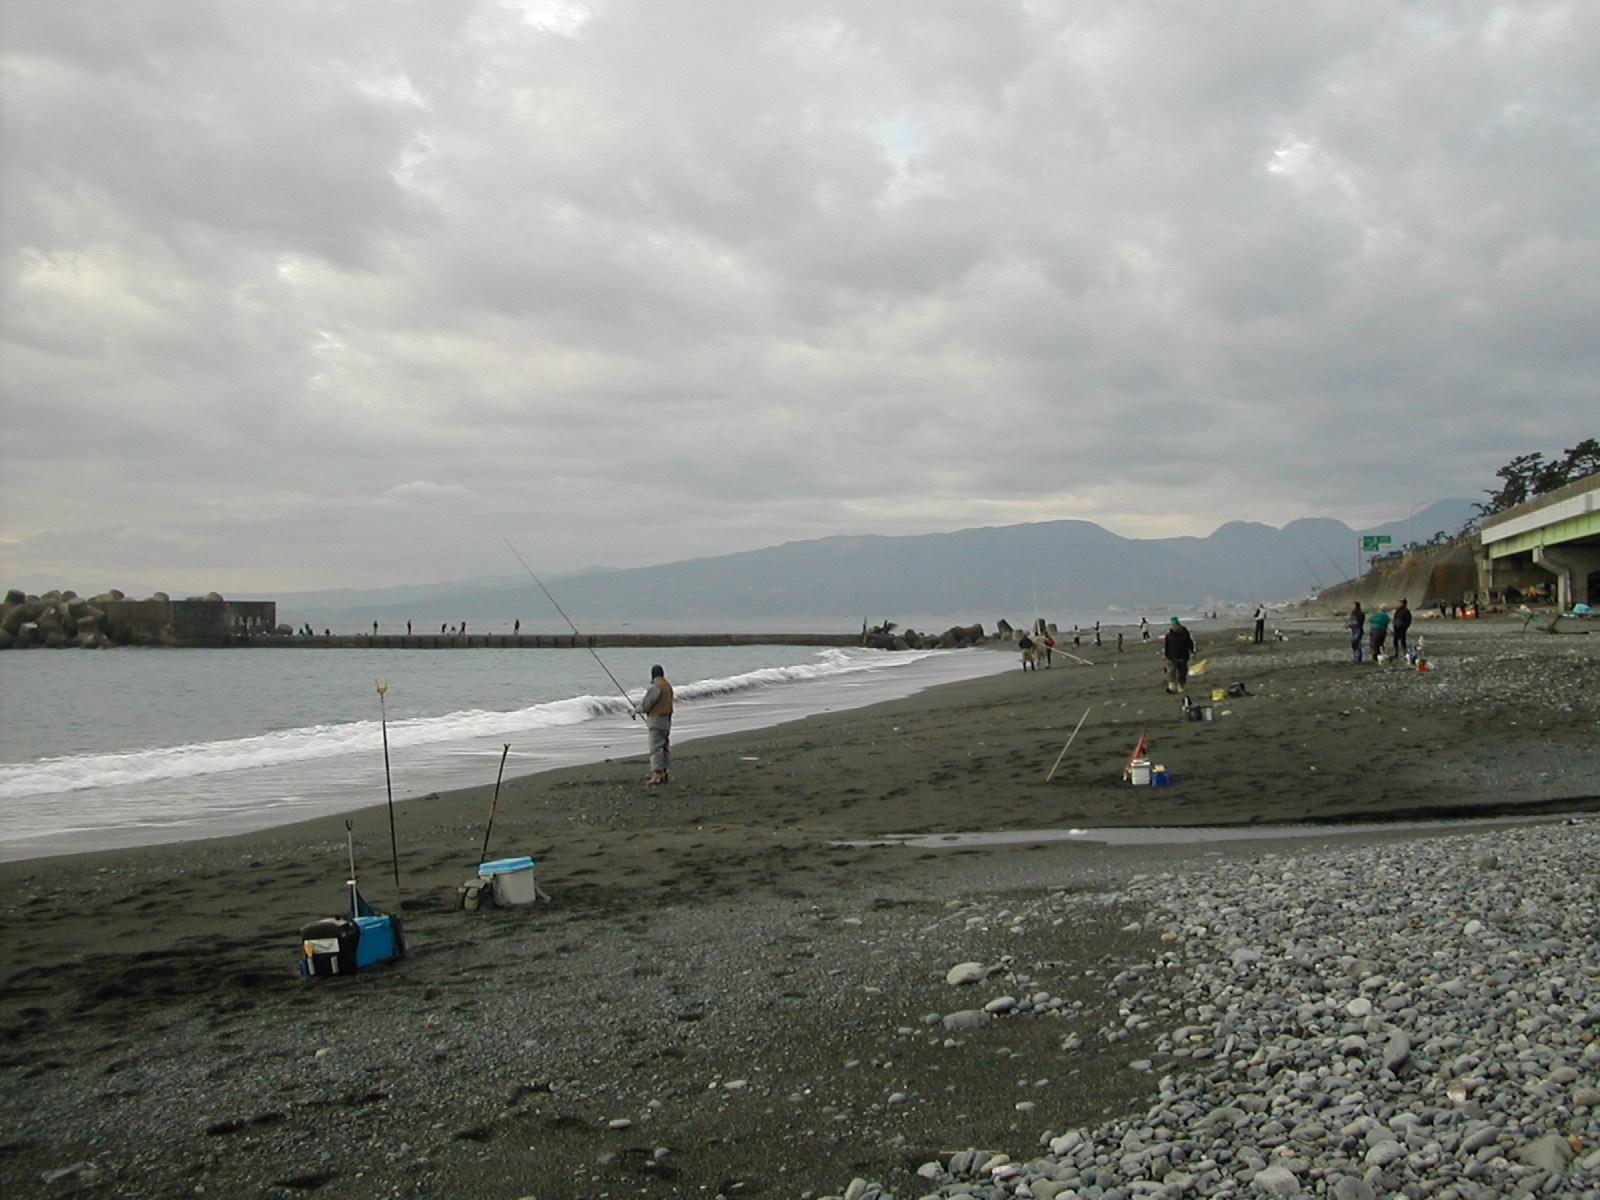 201223_002